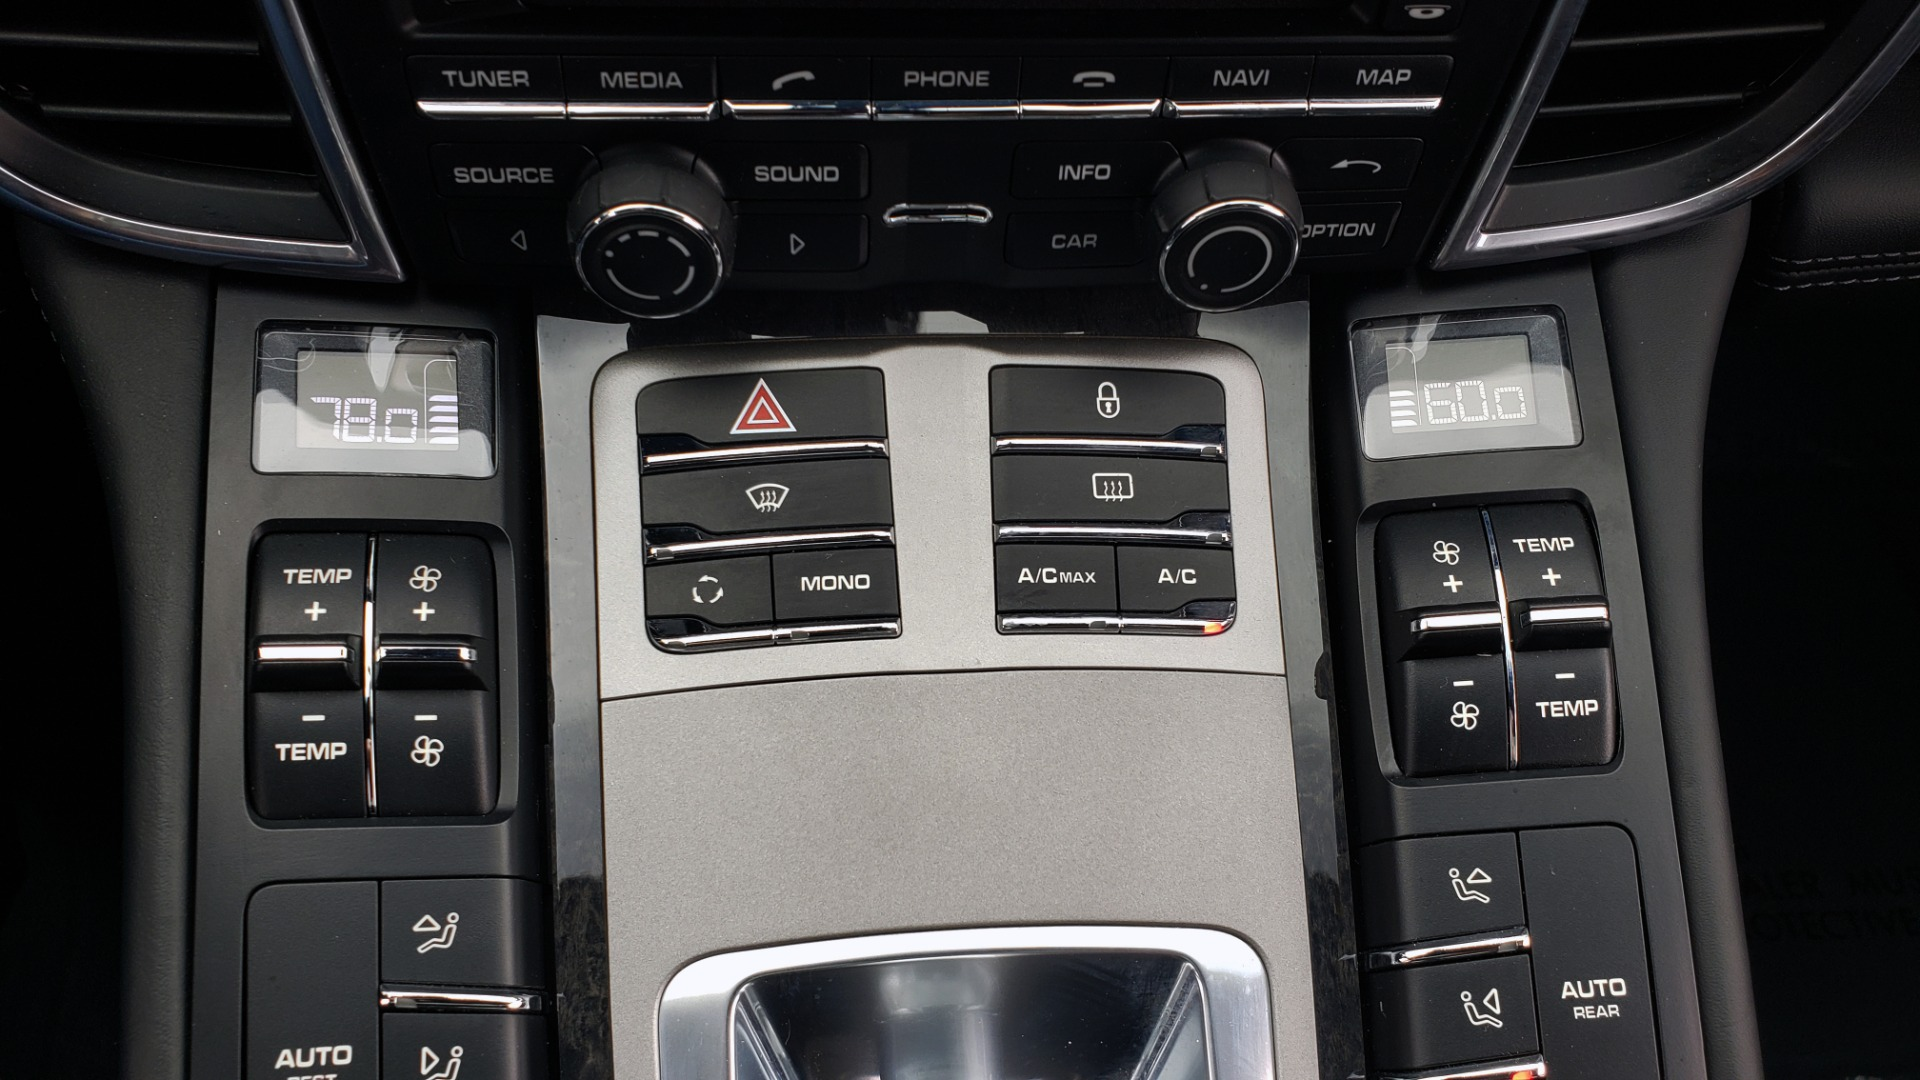 Used 2013 Porsche PANAMERA TURBO 4.8L V8 / AWD / NAV / SUNROOF / LCA / PARK ASST / BURMESTER for sale $45,995 at Formula Imports in Charlotte NC 28227 50